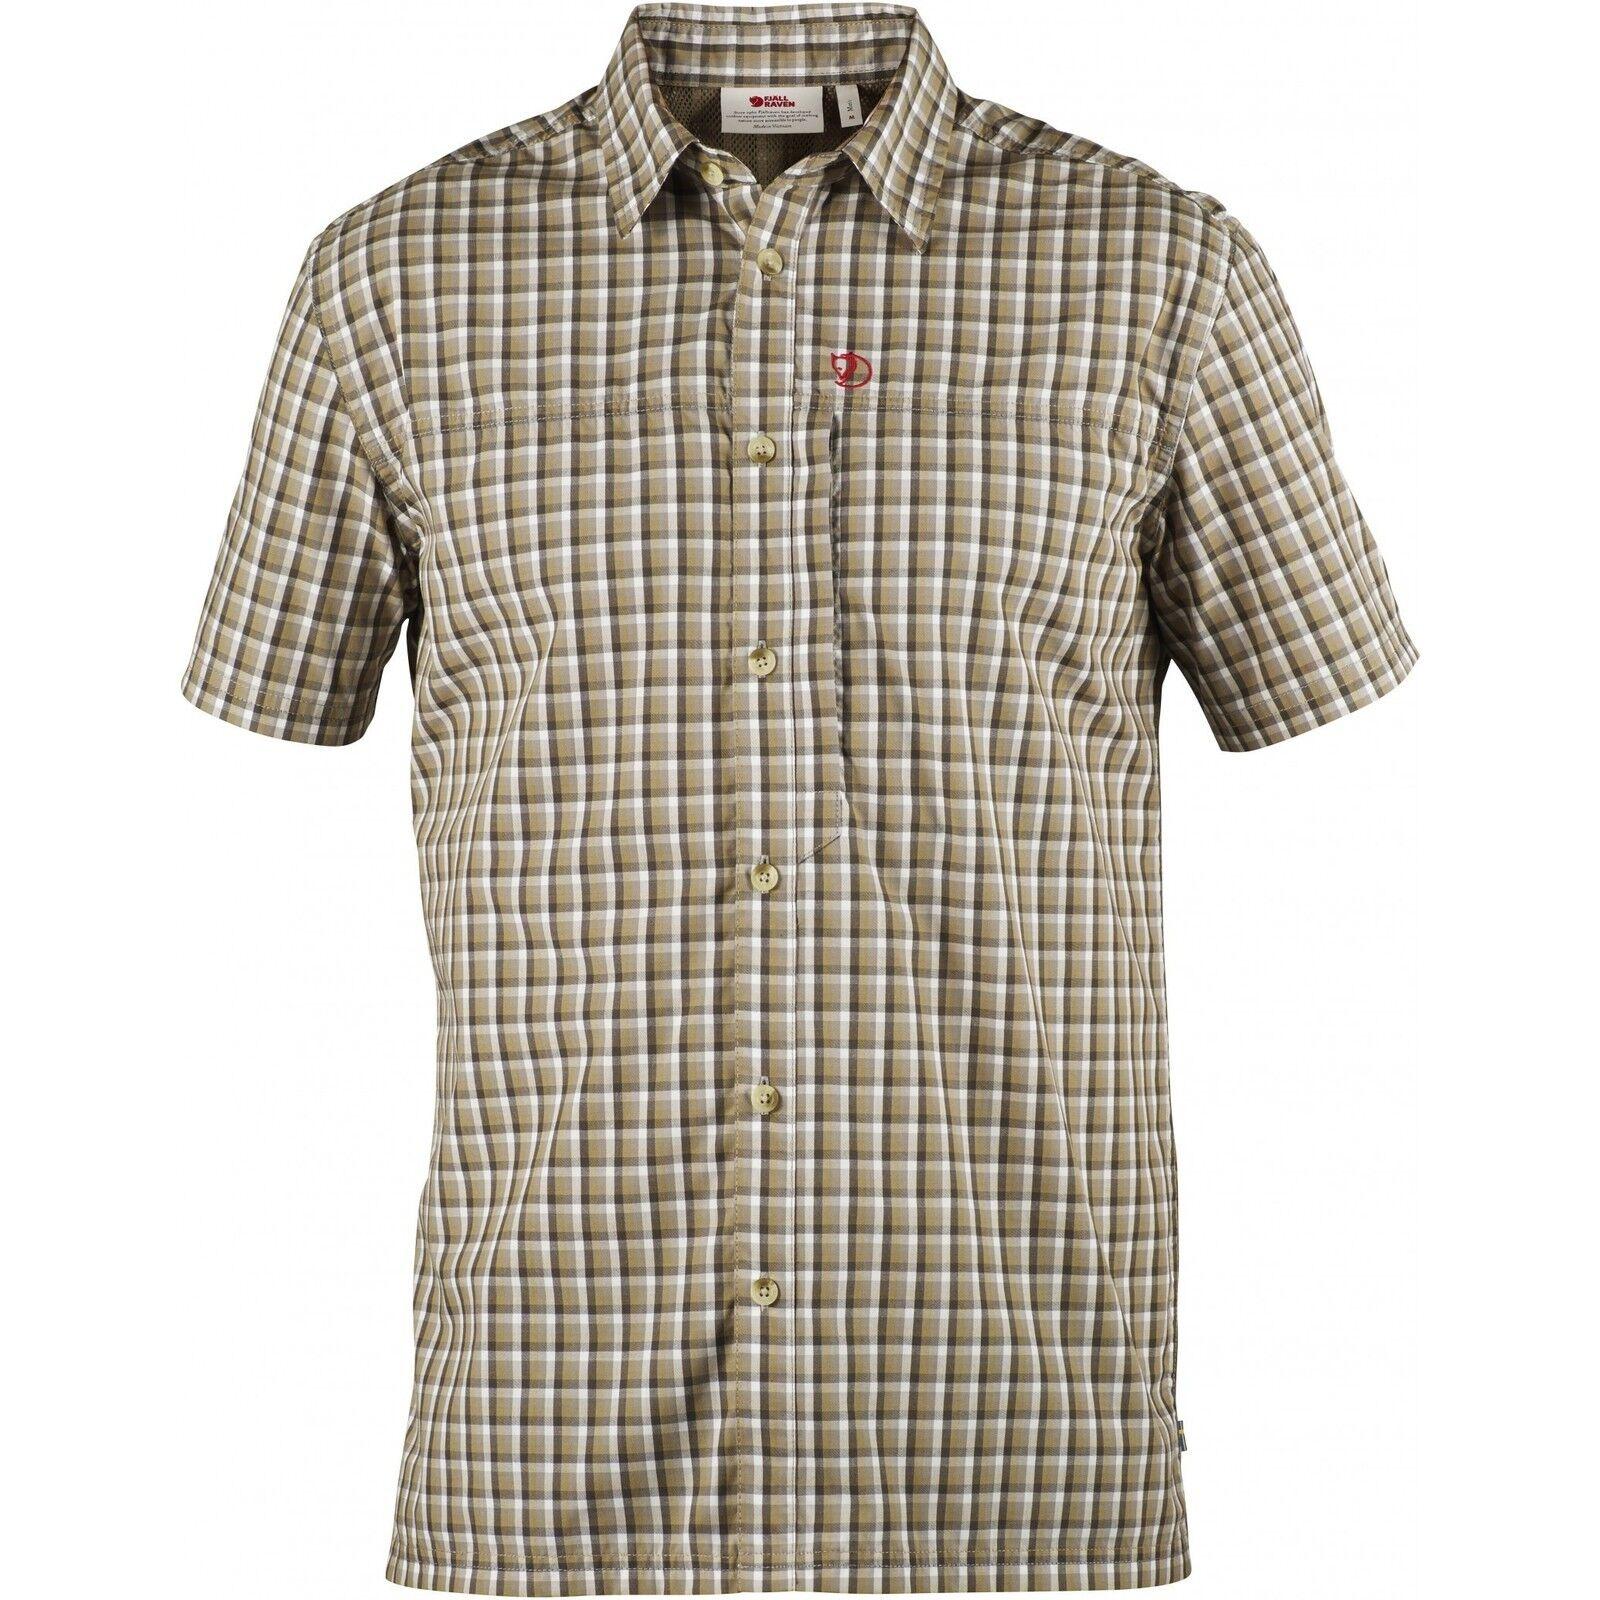 Laderas räven Svante camisa Comfort, manga corta-camisa, arena, función camisa, talla s